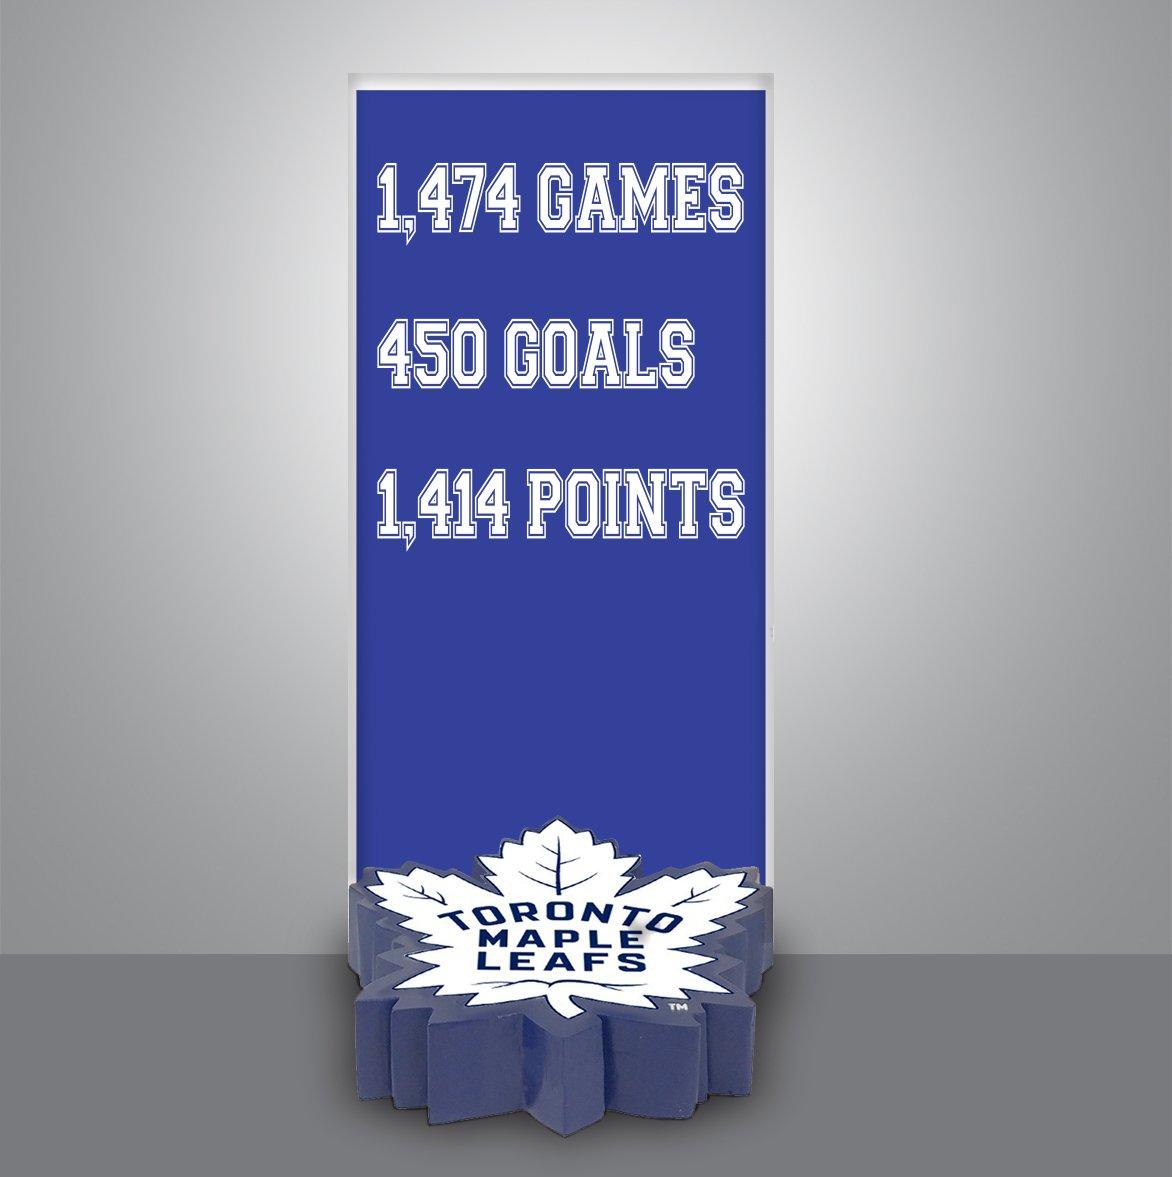 Toronto Maple Leafs Doug Gilmour Bobblehead Gallery